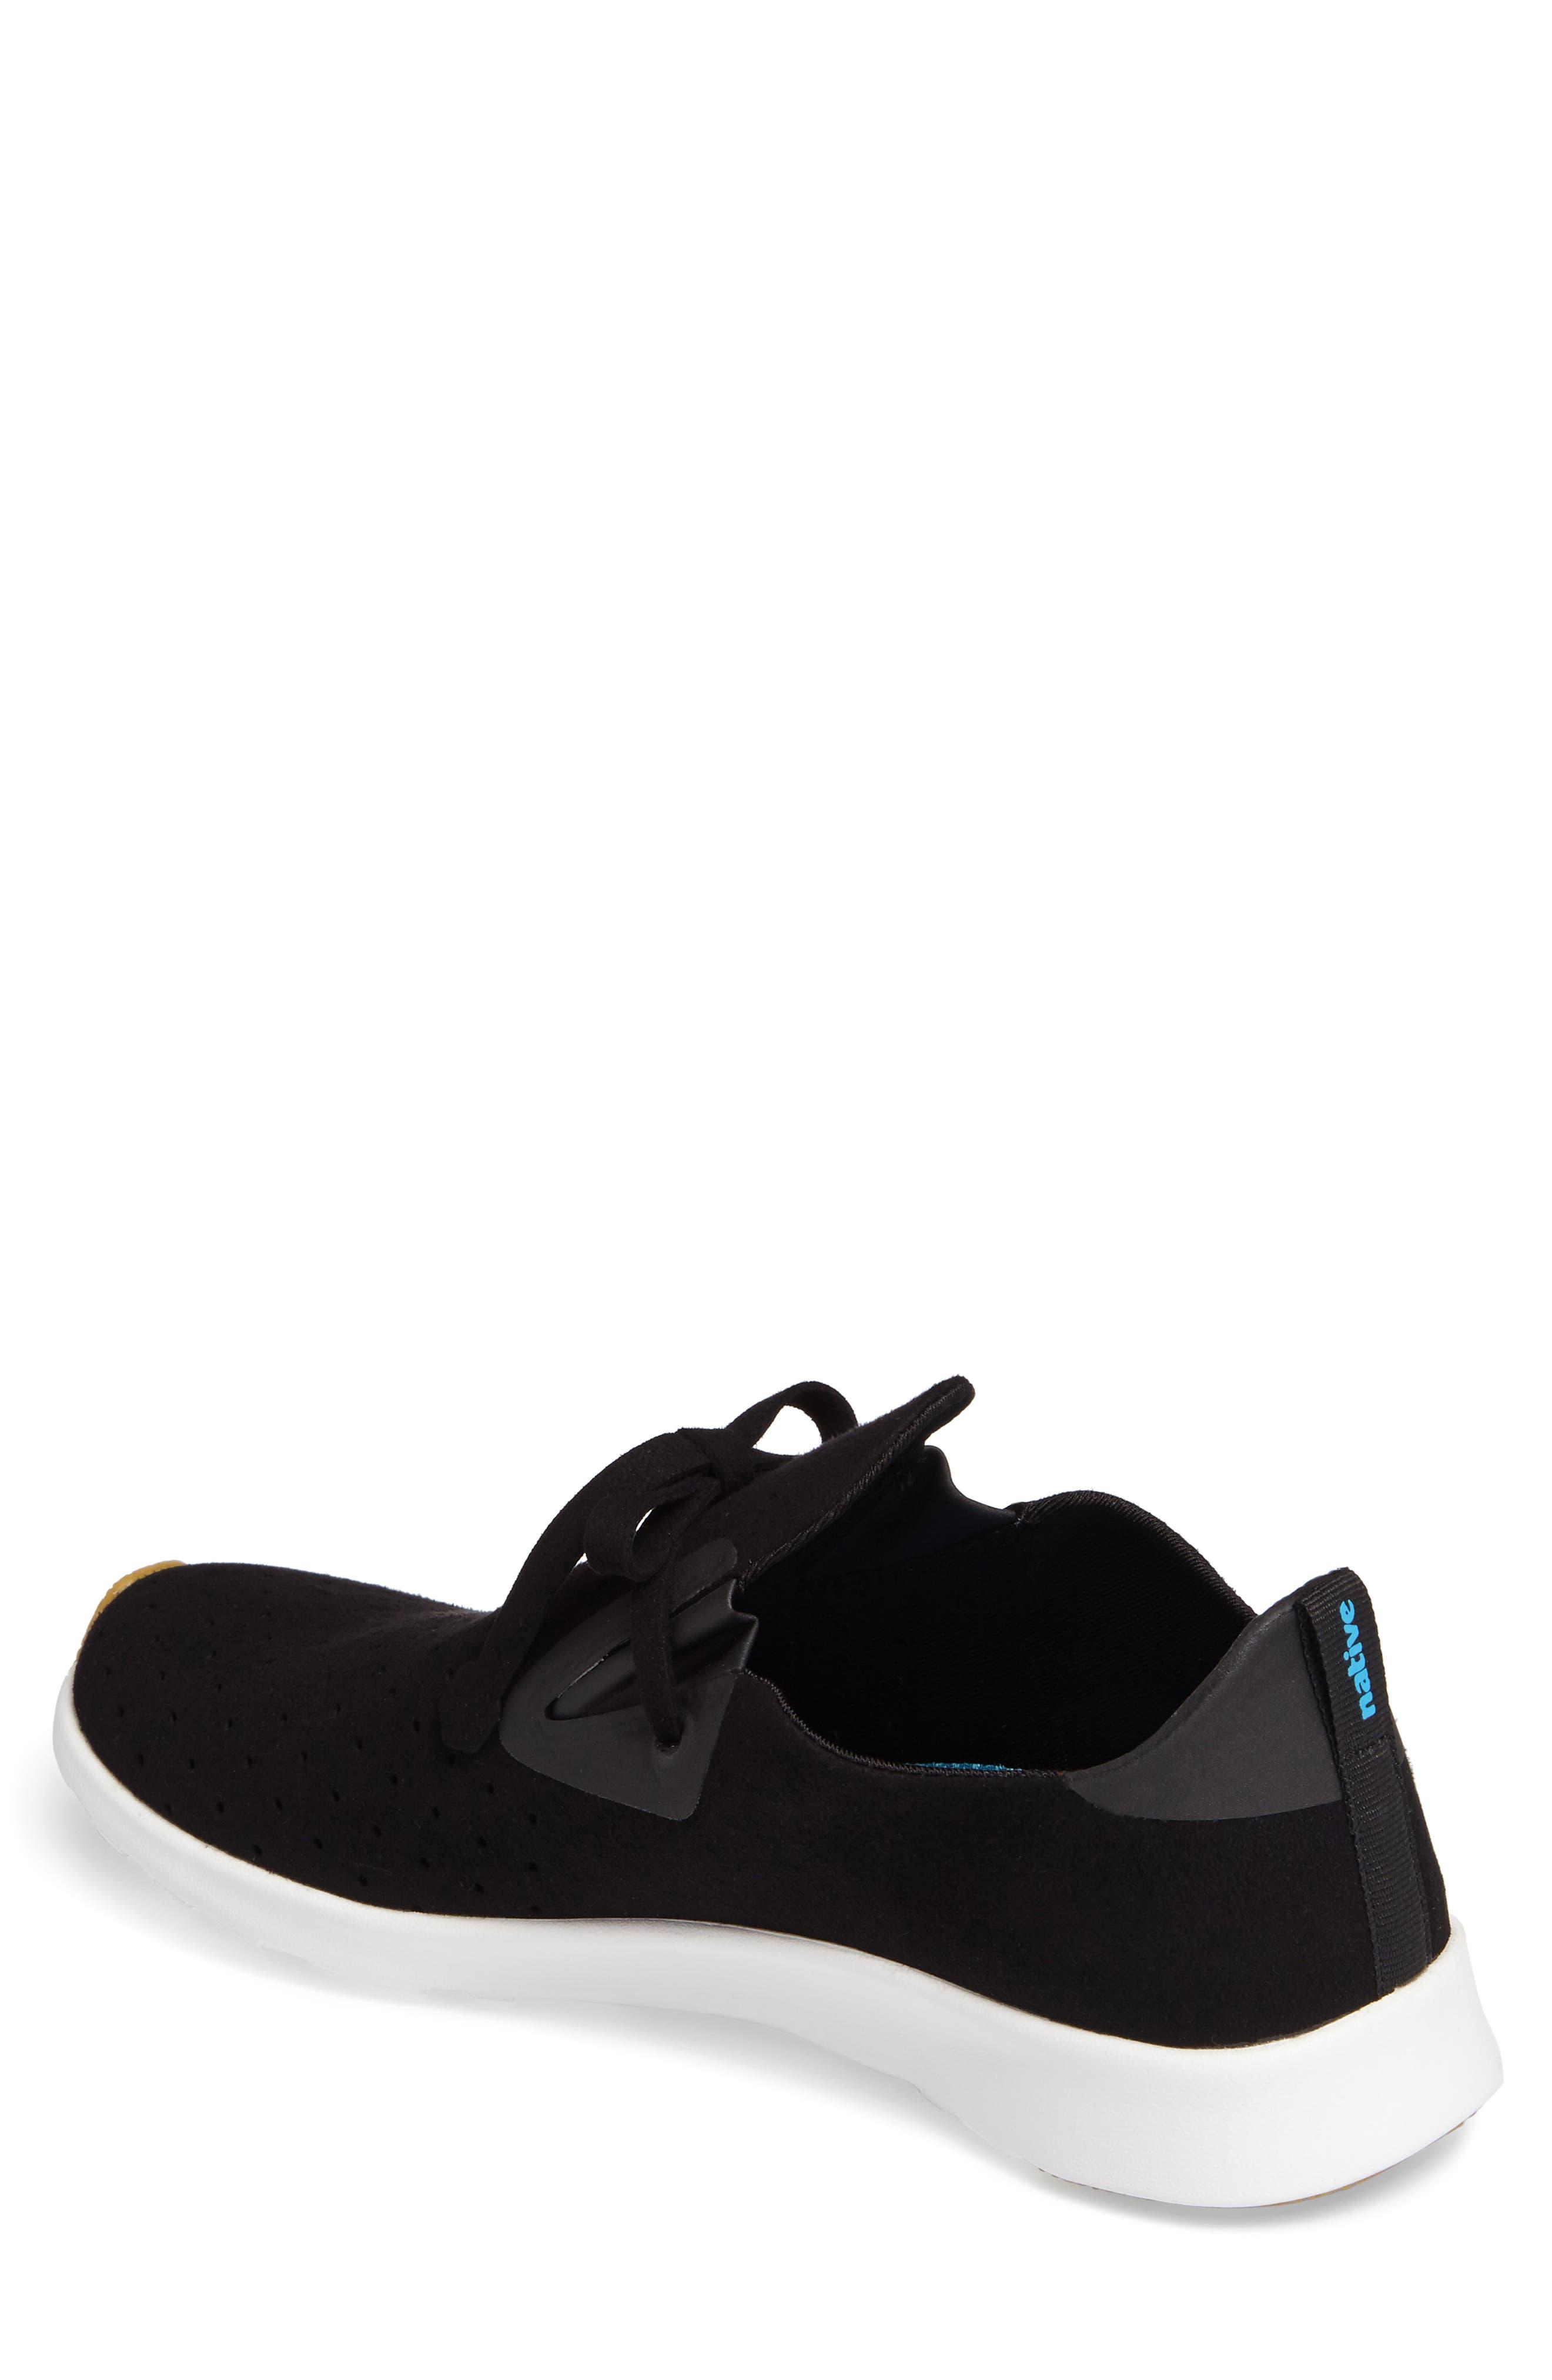 Alternate Image 2  - Native Shoes 'Apollo' Sneaker (Men)